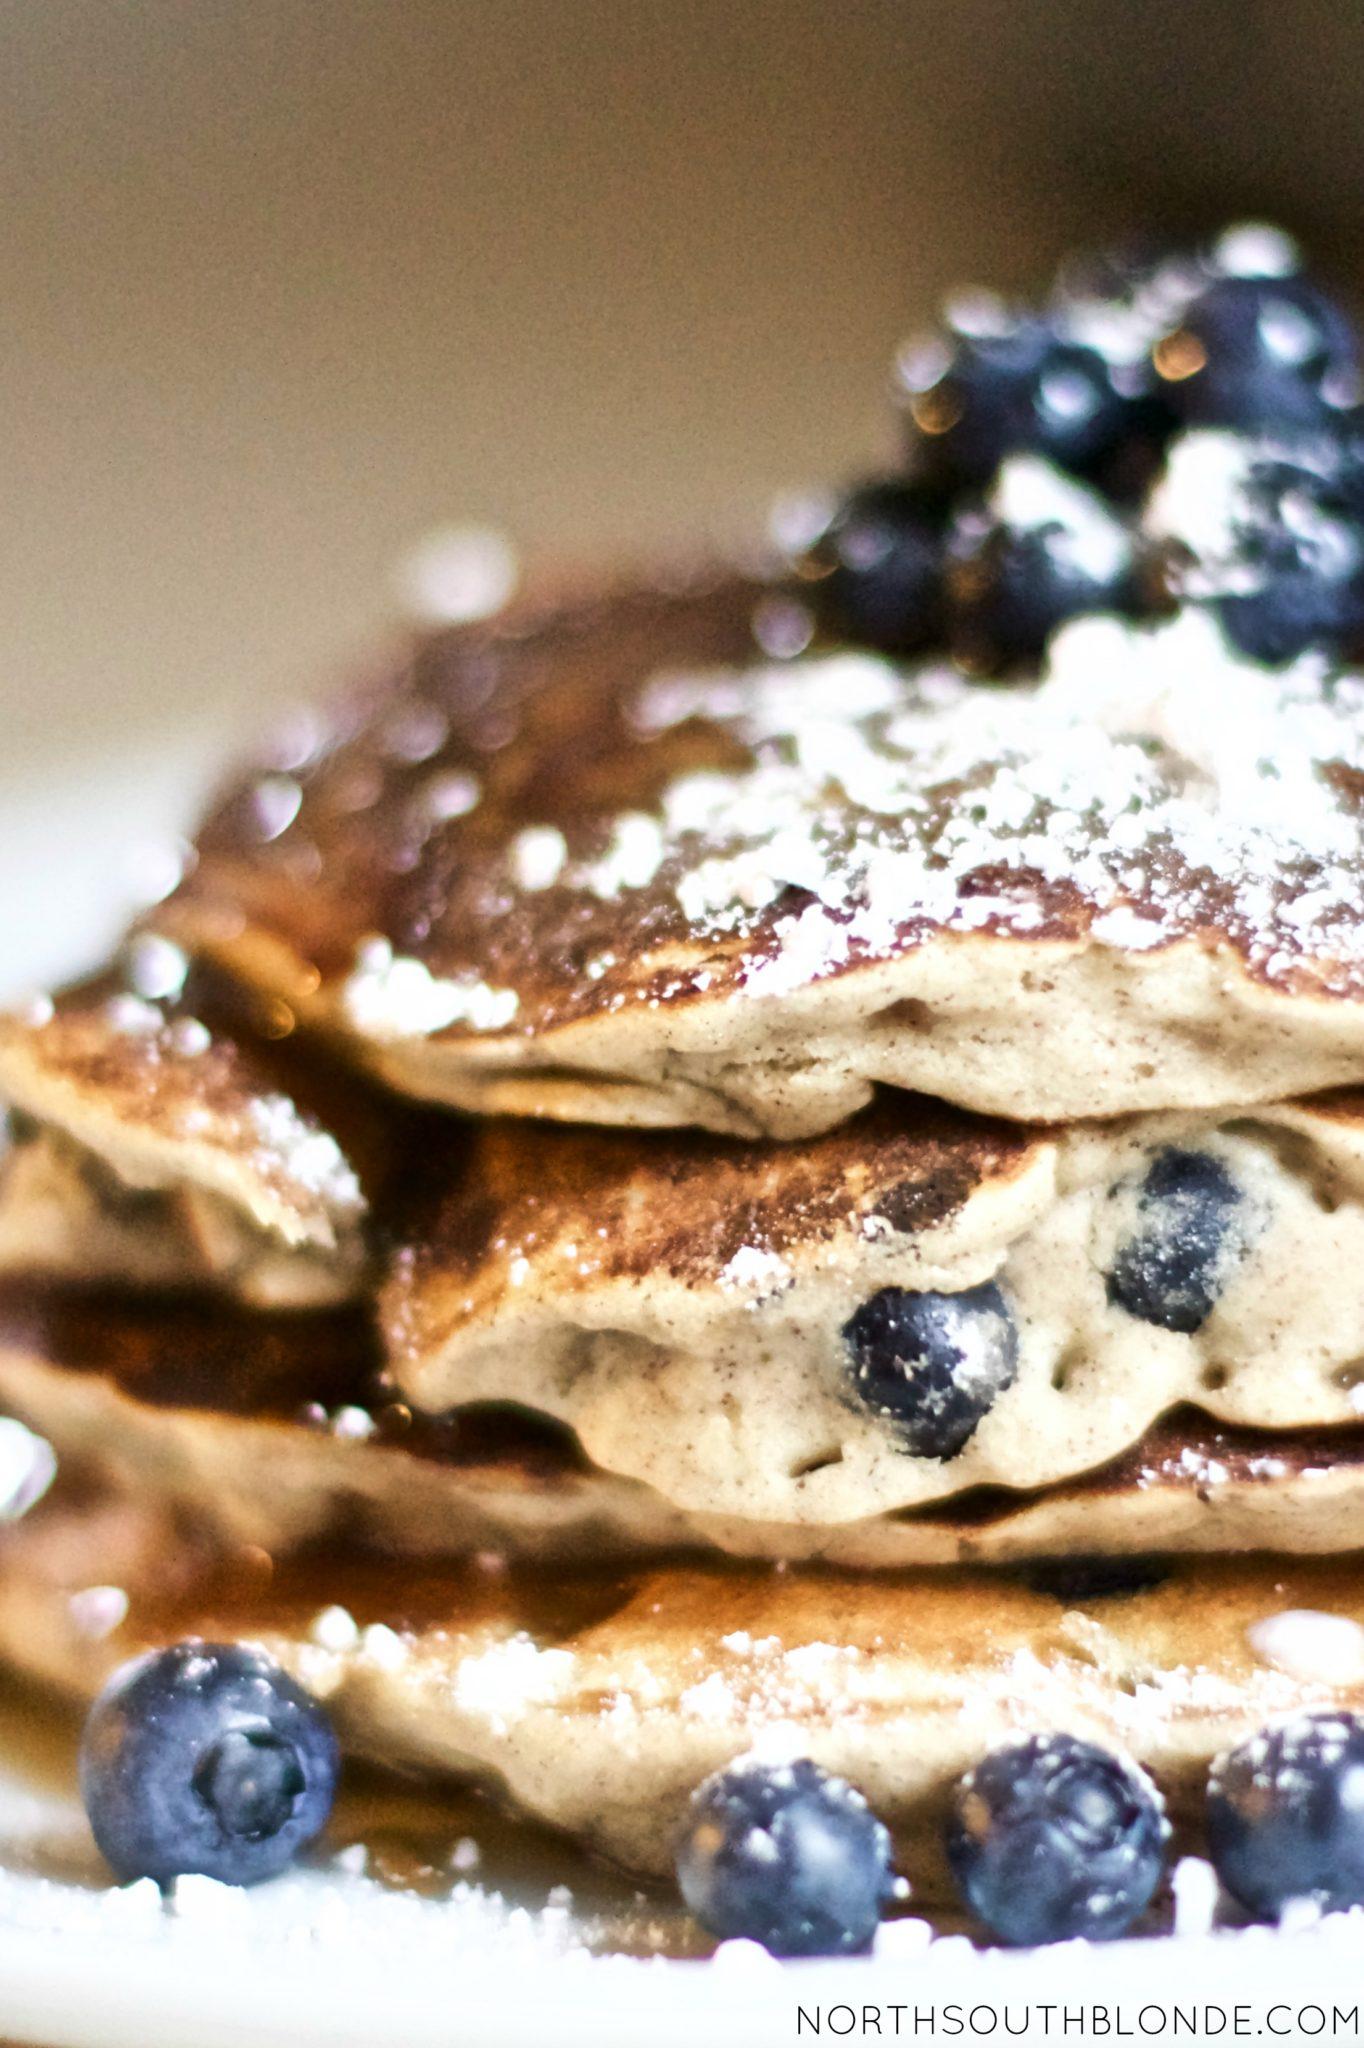 Blueberry Banana Cinnamon Pancakes (Vegan, Paleo, Gluten-Free)